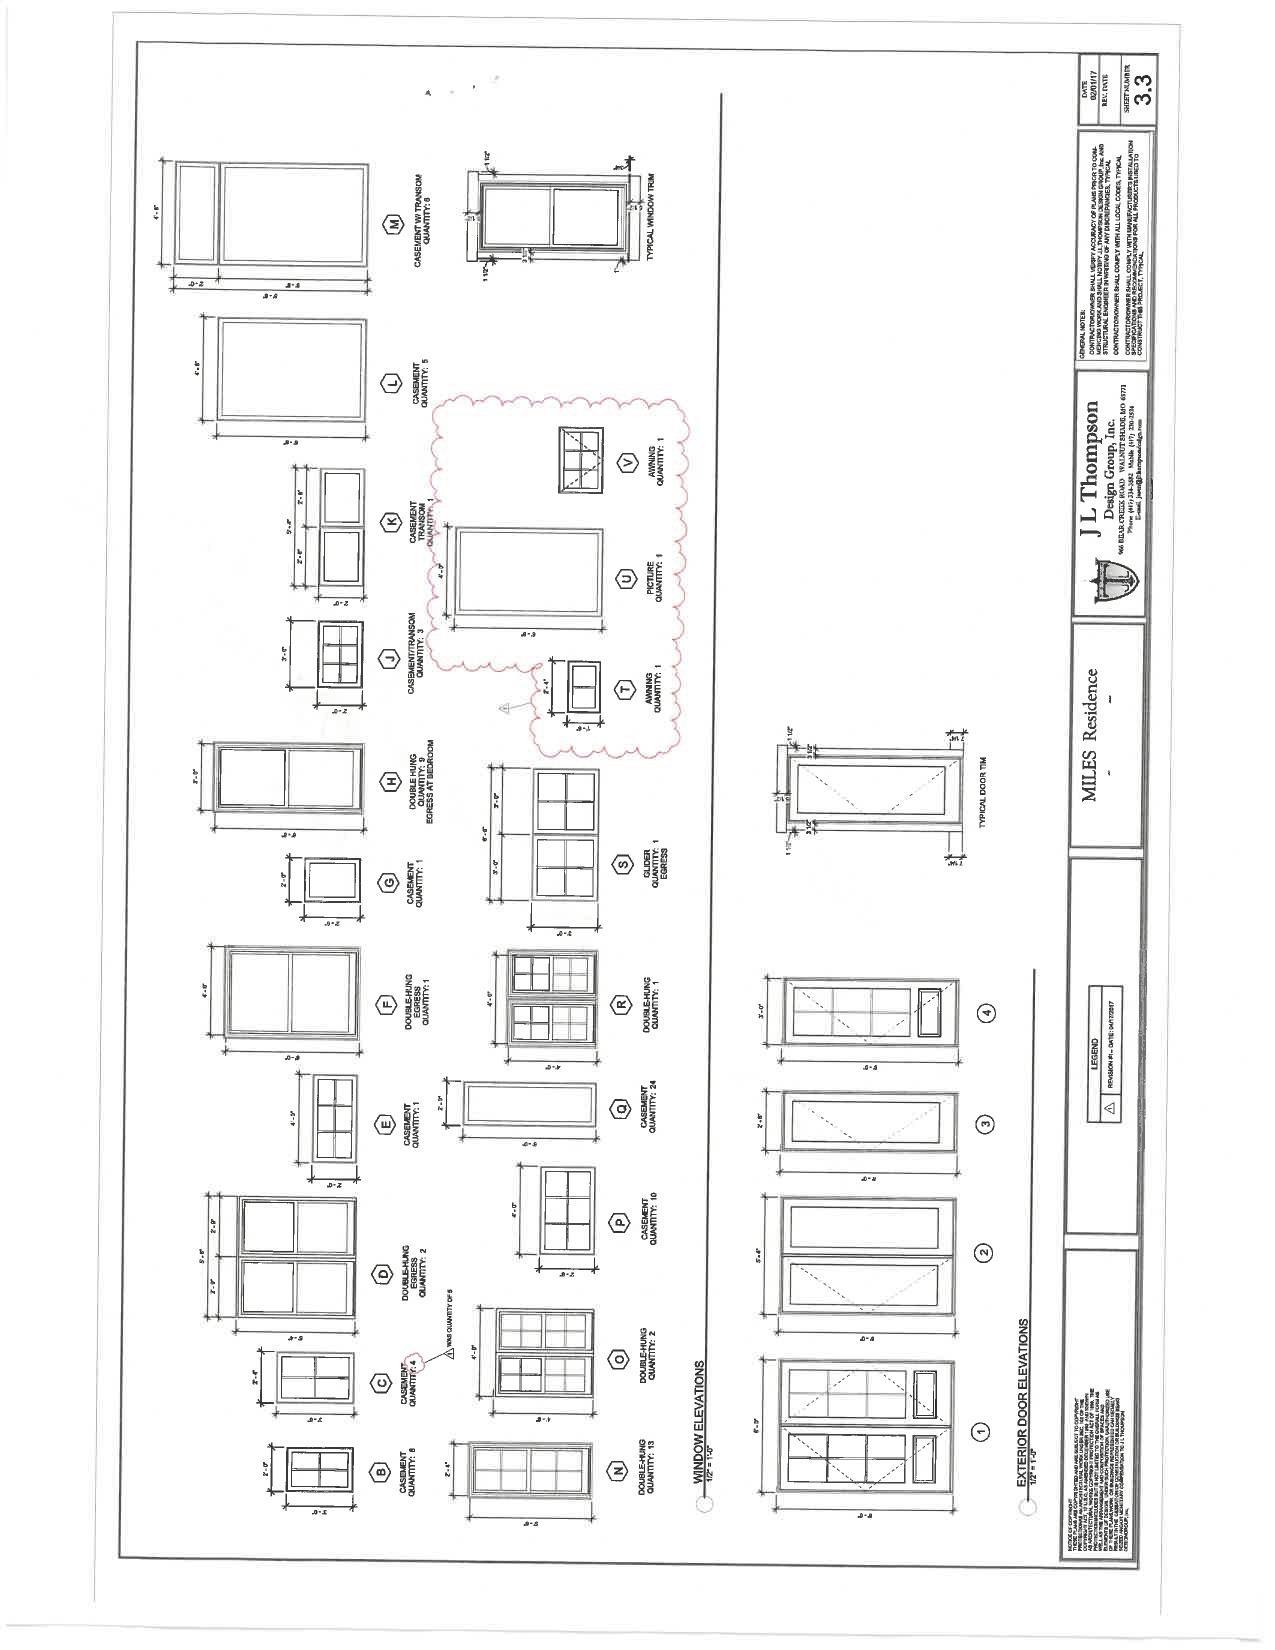 395 Tracy Street Branson, MO 65616